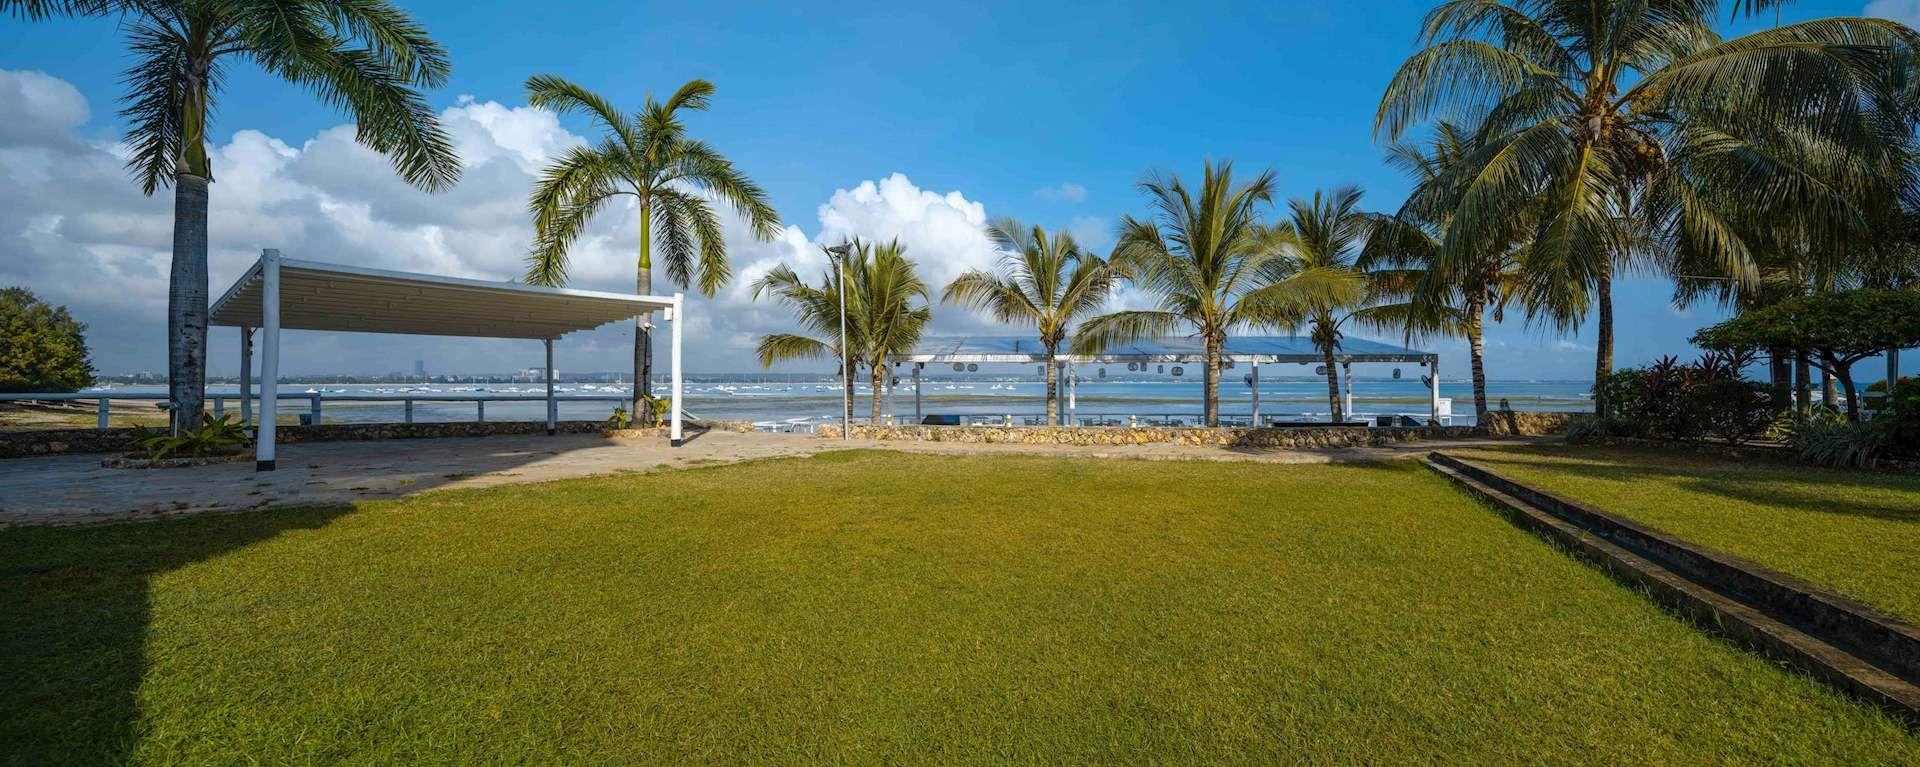 Best Western Coral Beach Hotel11